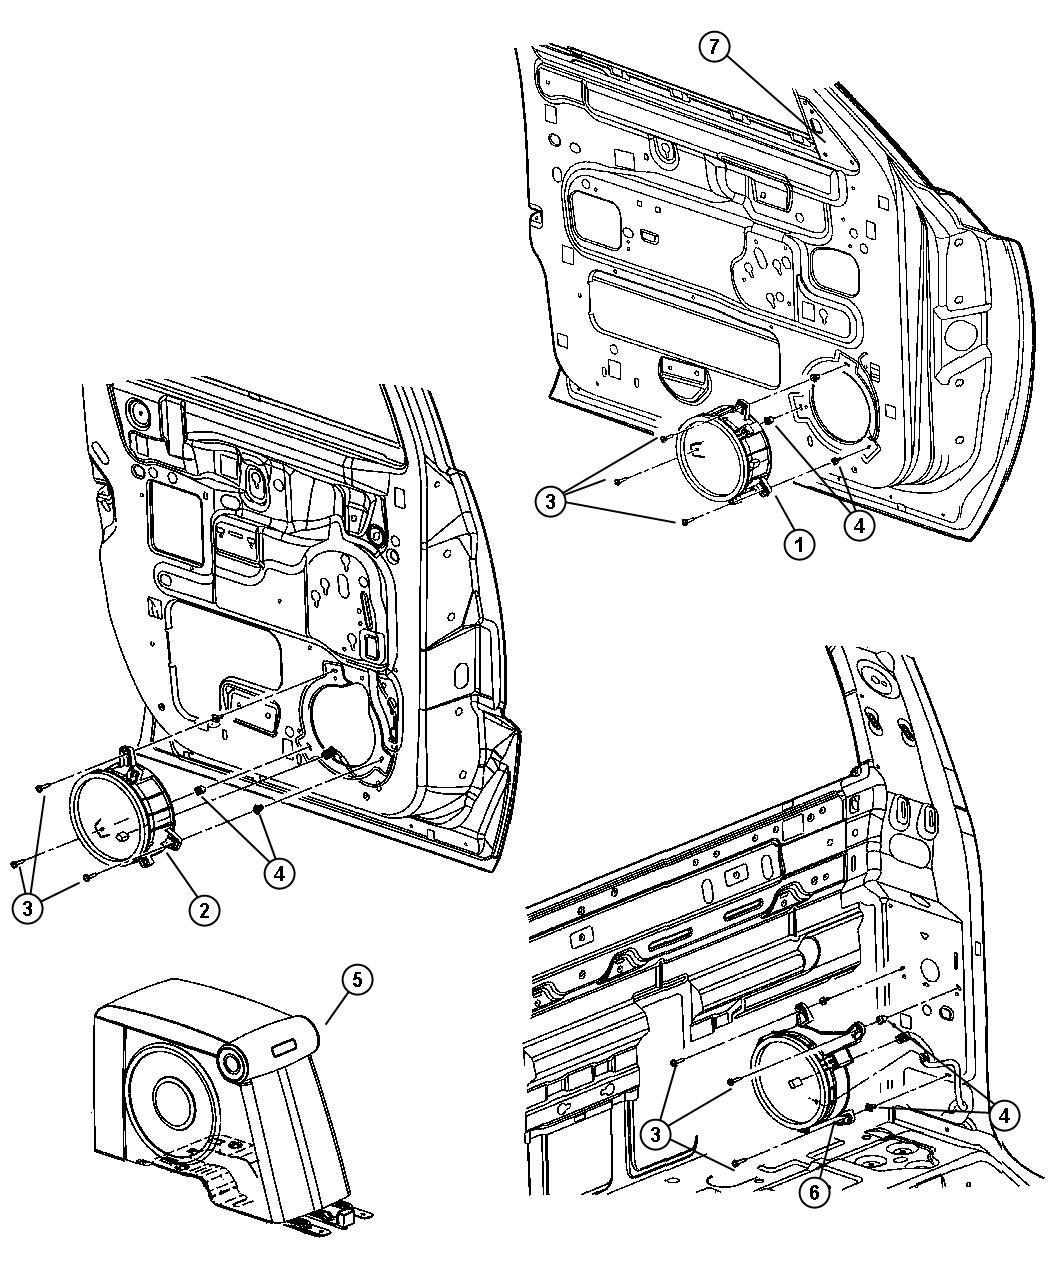 Dodge Ram 2500 Screw. 190-16x1.00. Mounting, side, speaker